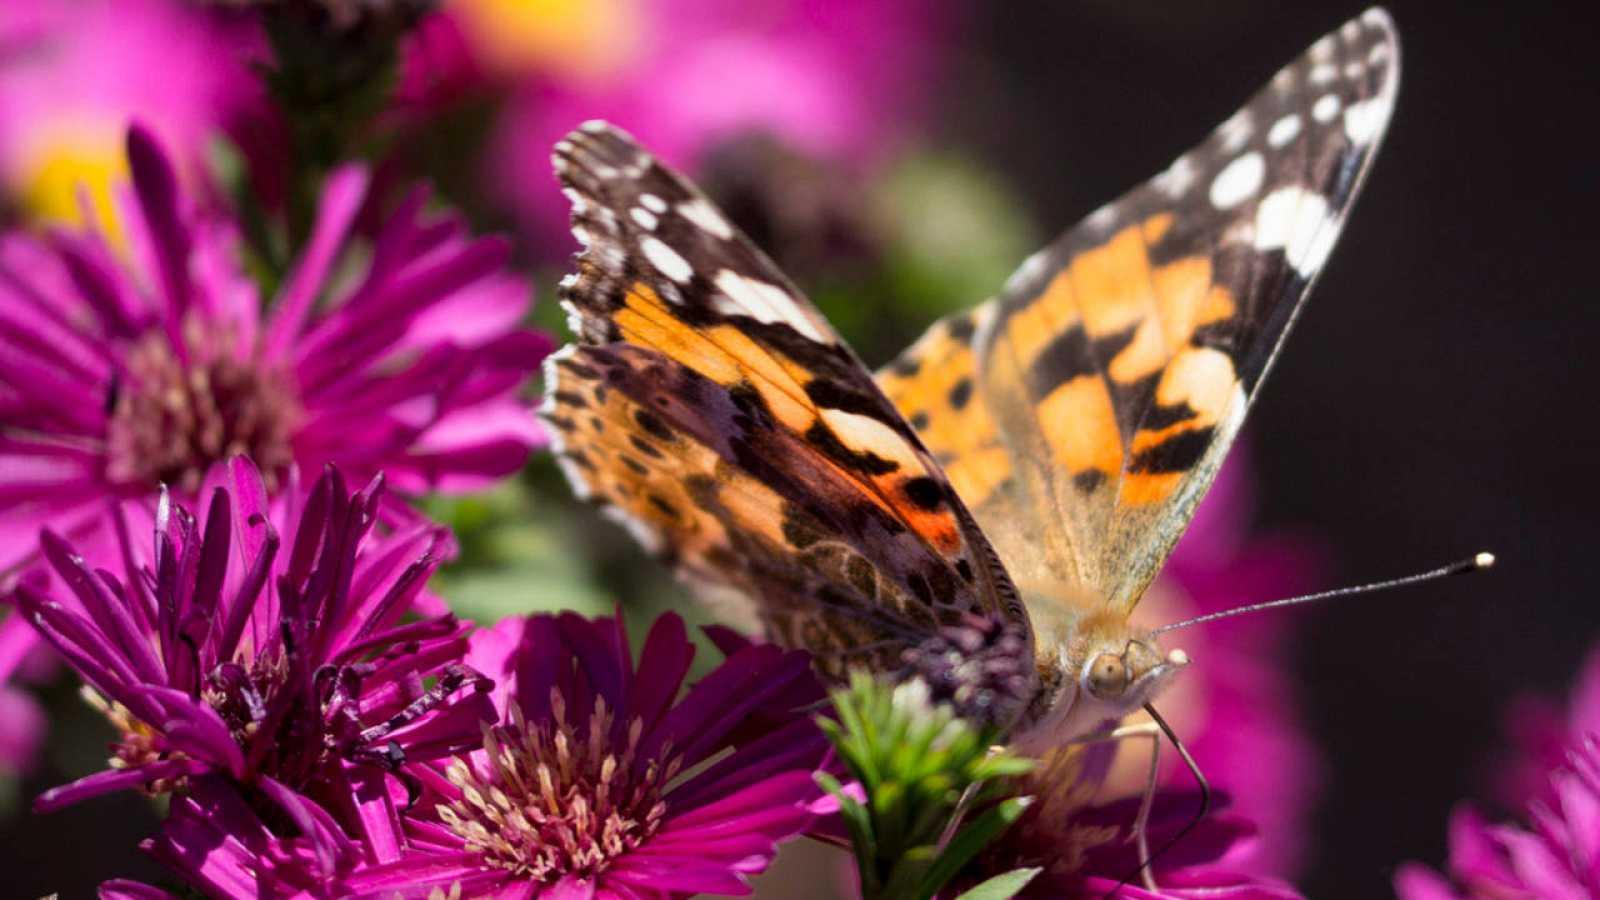 Mariposas Con Genes De Avispa La Naturaleza Crea Animales